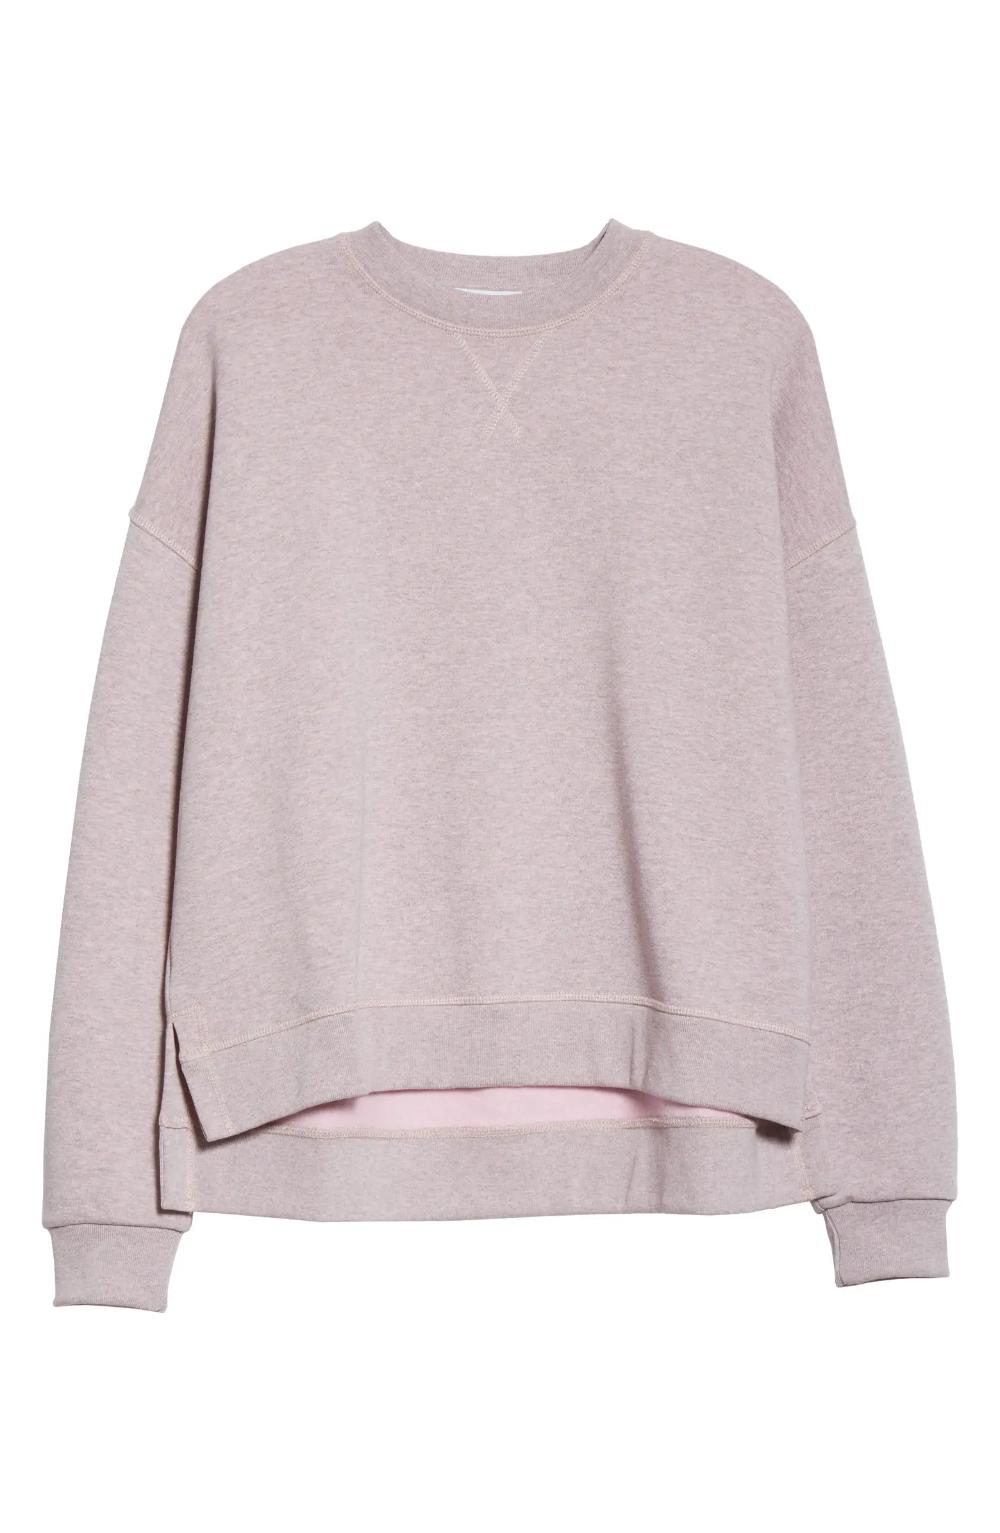 Ganni Isoli High Low Cotton Blend Sweatshirt Nordstrom Designer Sweatshirts Sweatshirts Cotton Blend [ 1533 x 1000 Pixel ]